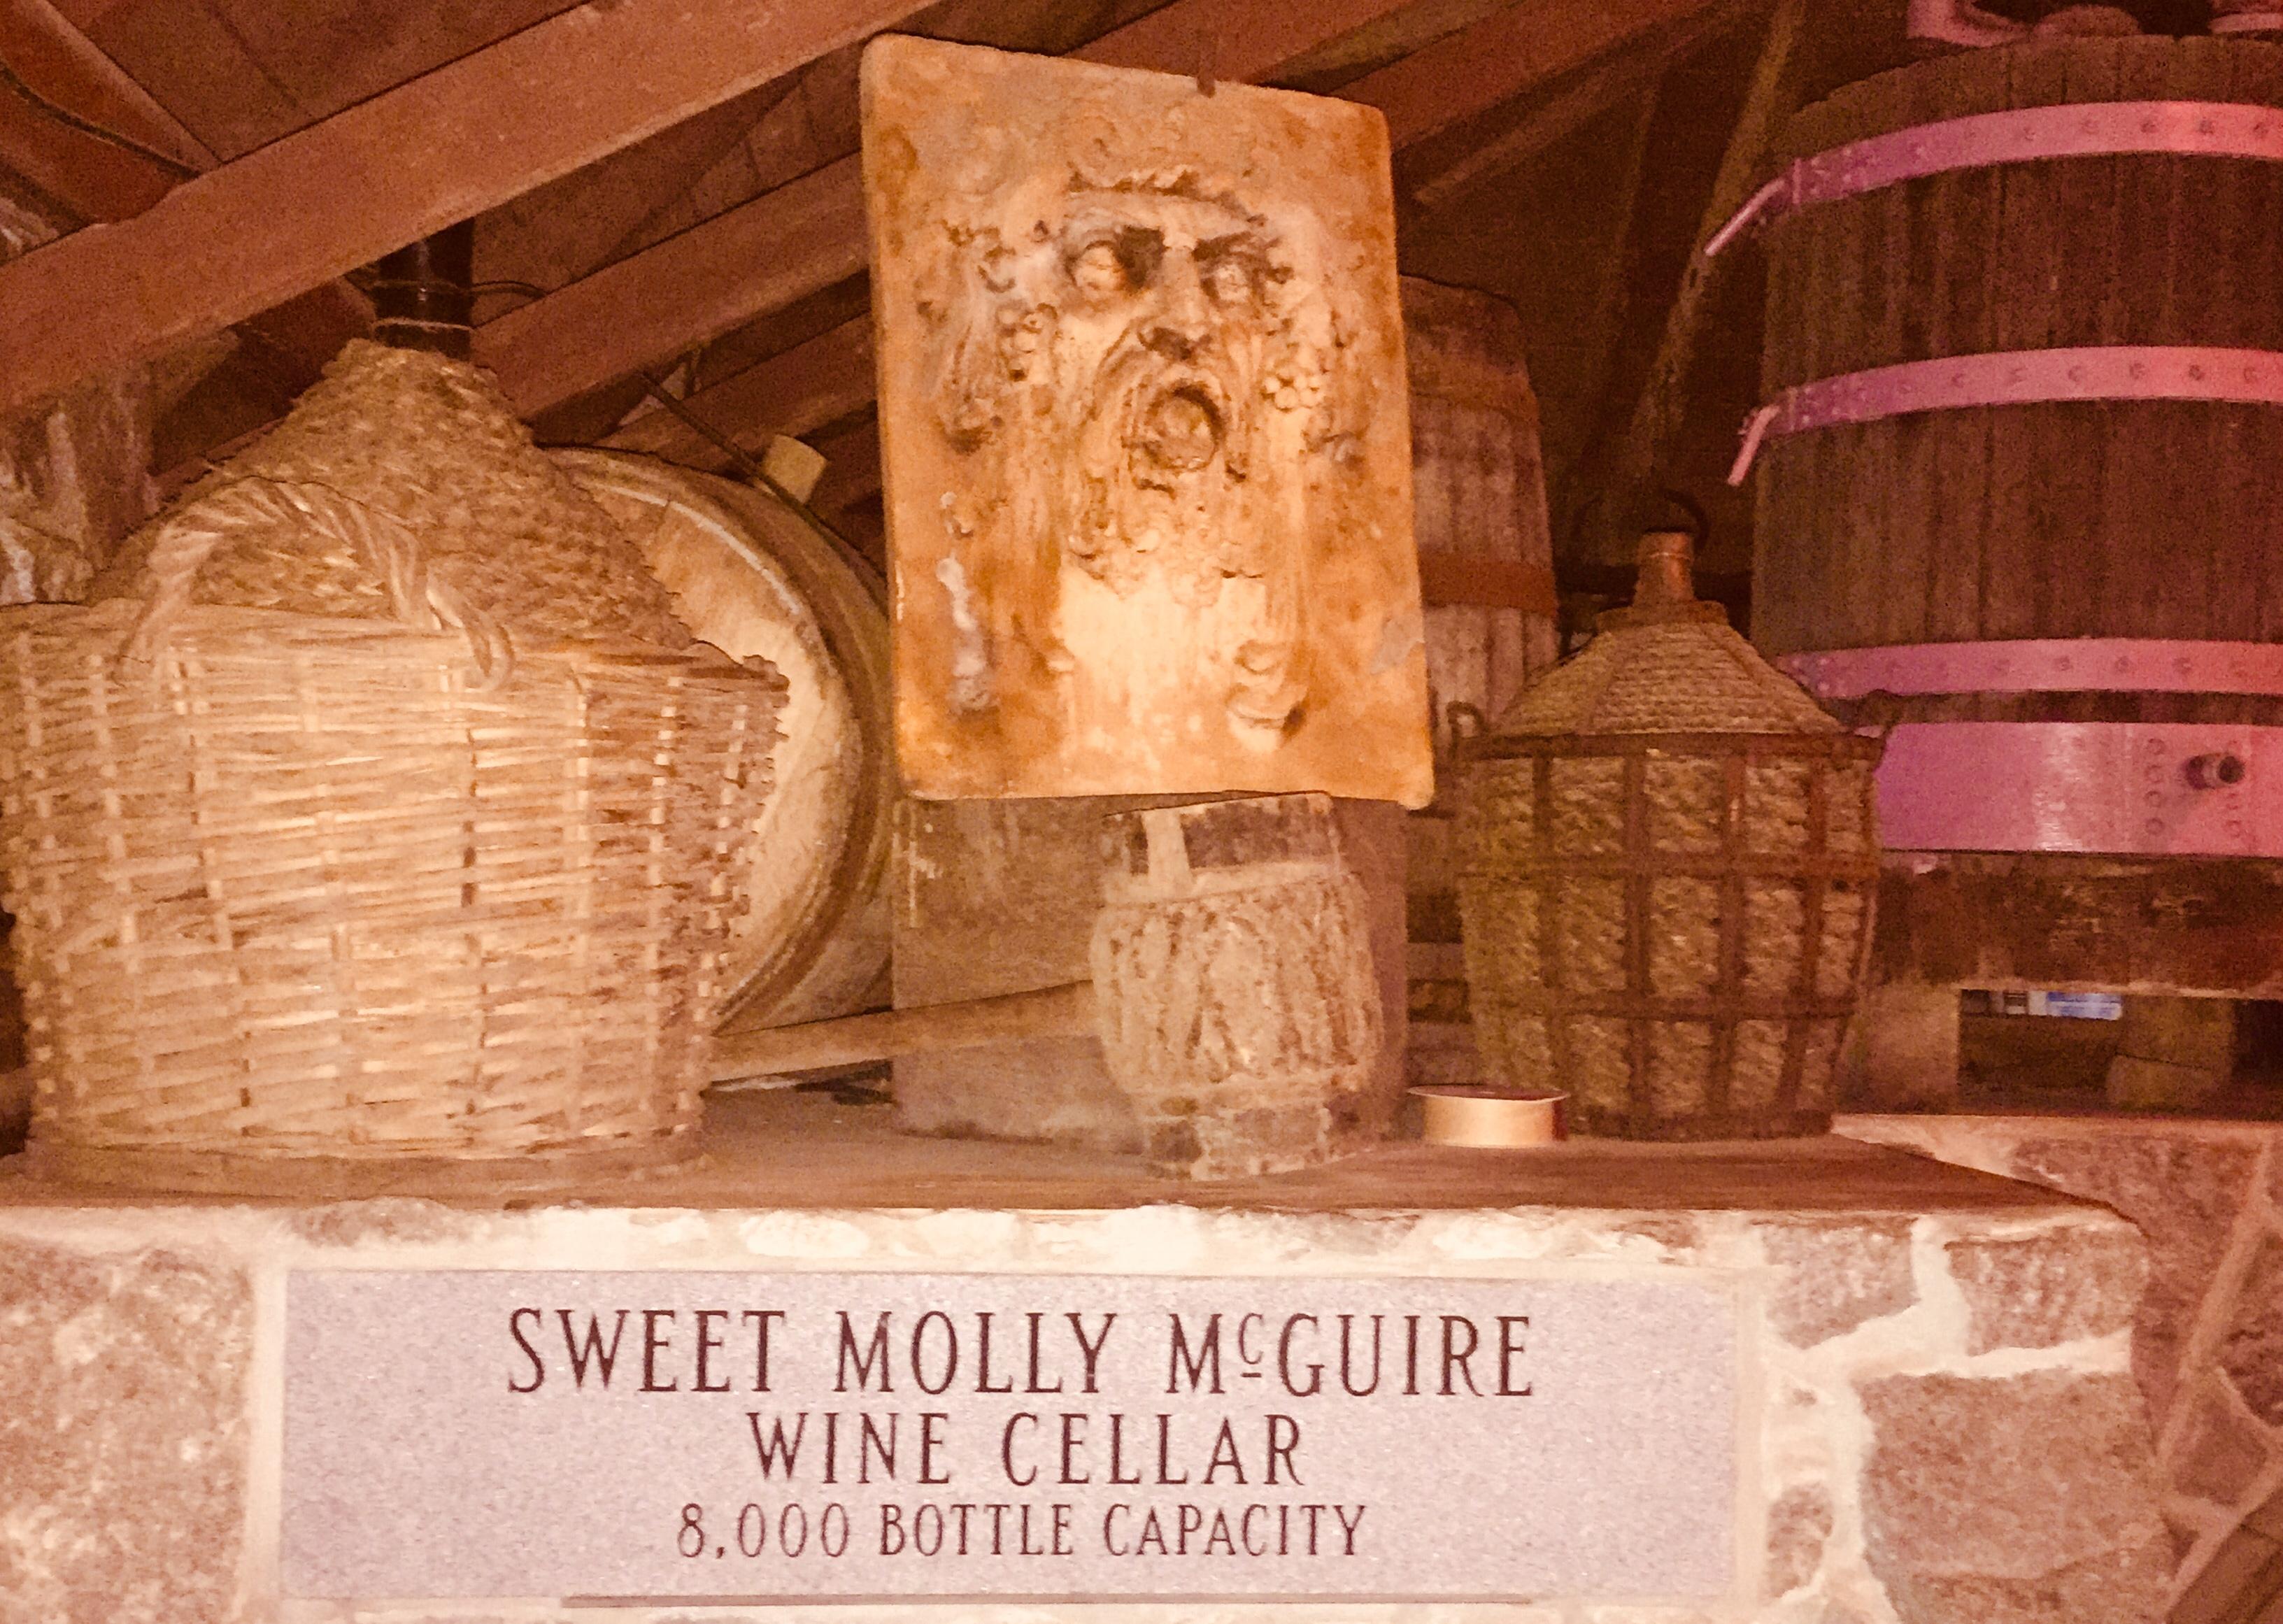 McGuire's wine cellar